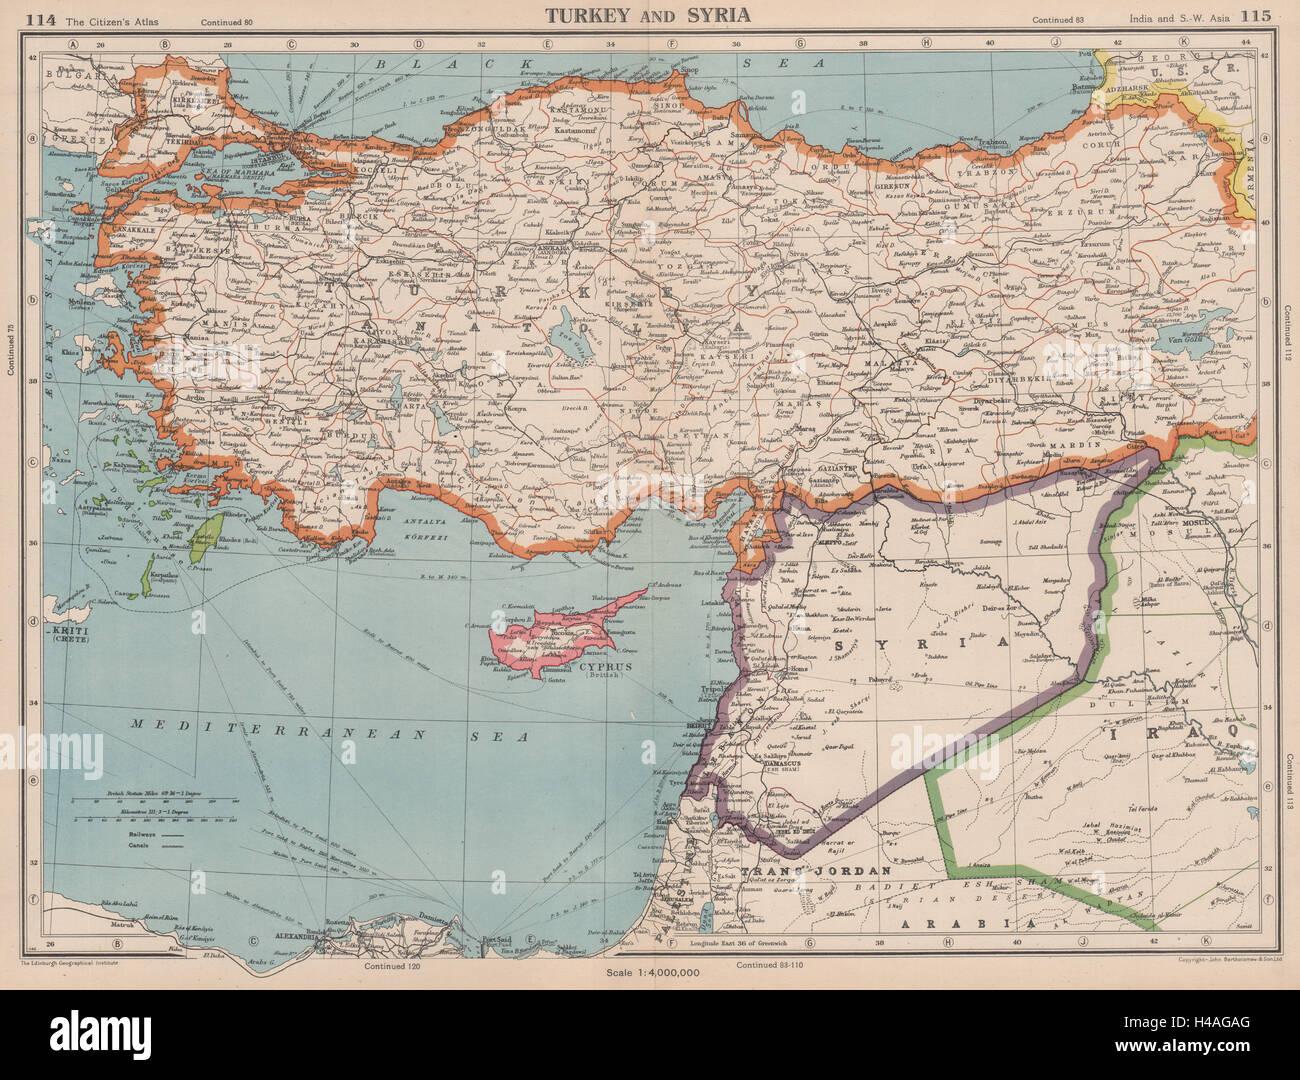 Turkey levant syria incorporates lebanon palestine predates syria incorporates lebanon palestine predates israel 1944 map gumiabroncs Images